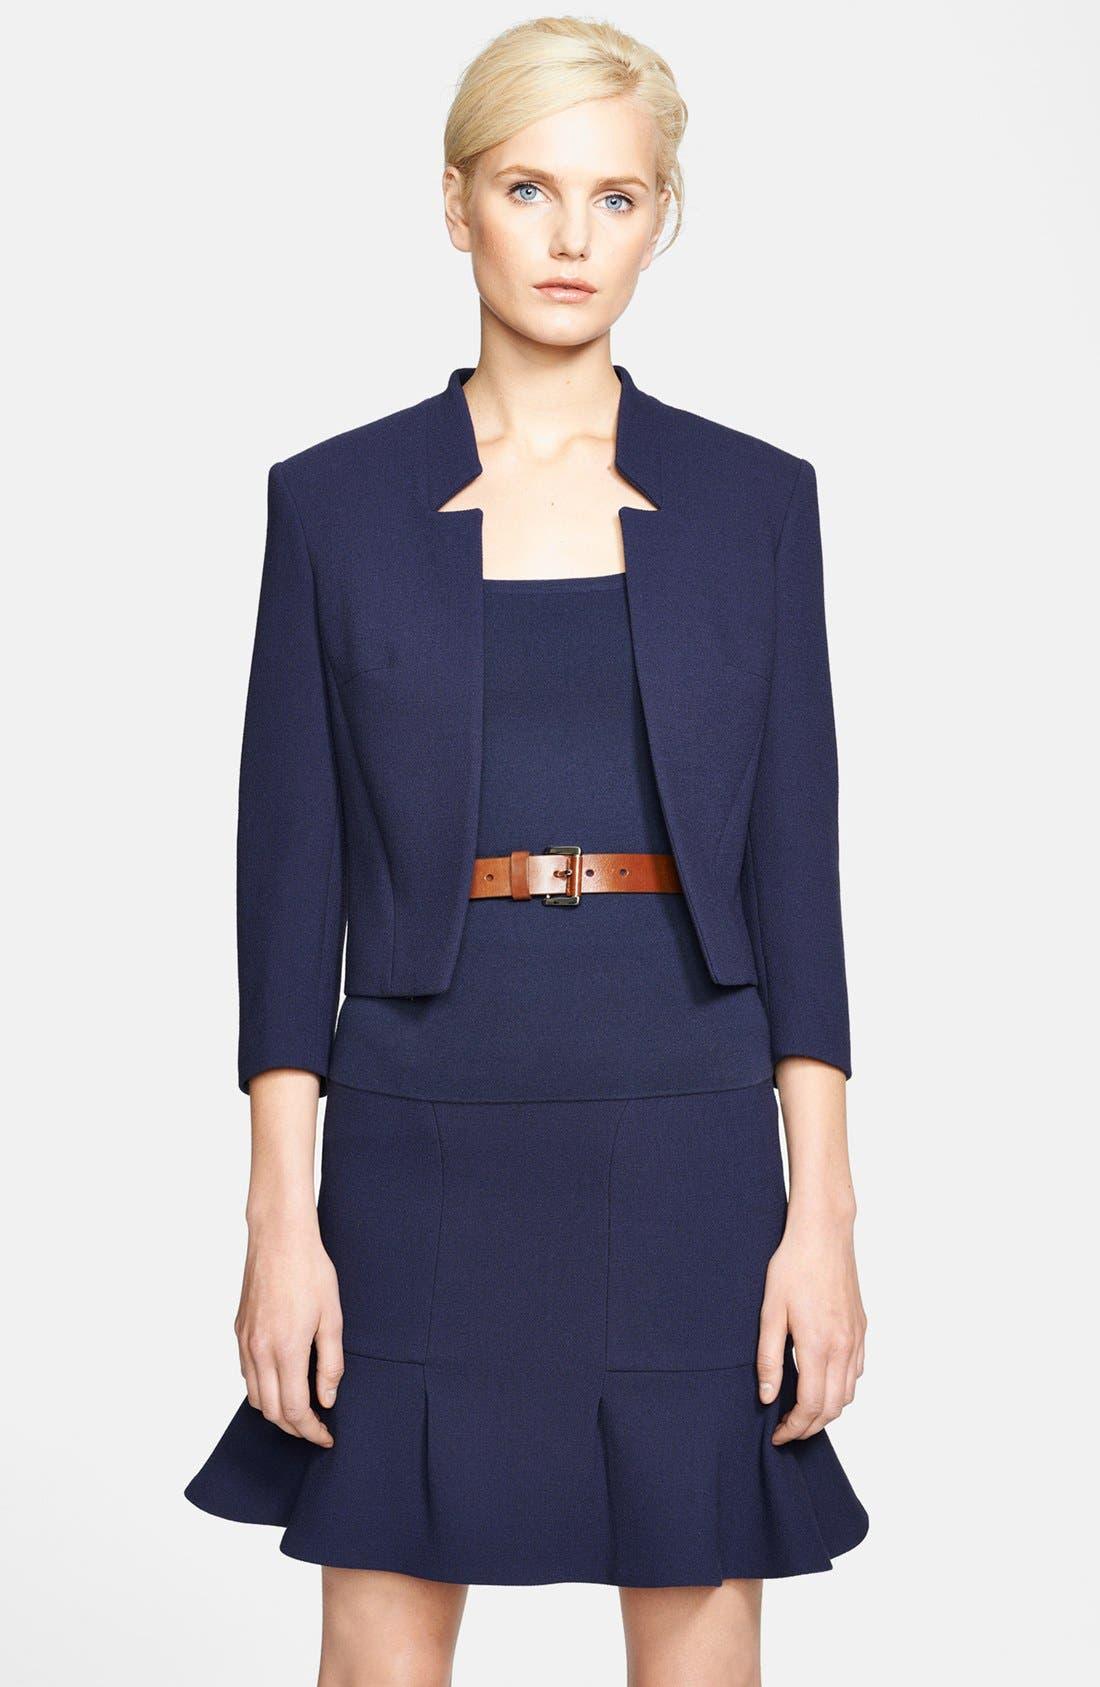 Main Image - Michael Kors Bouclé Stretch Wool Jacket